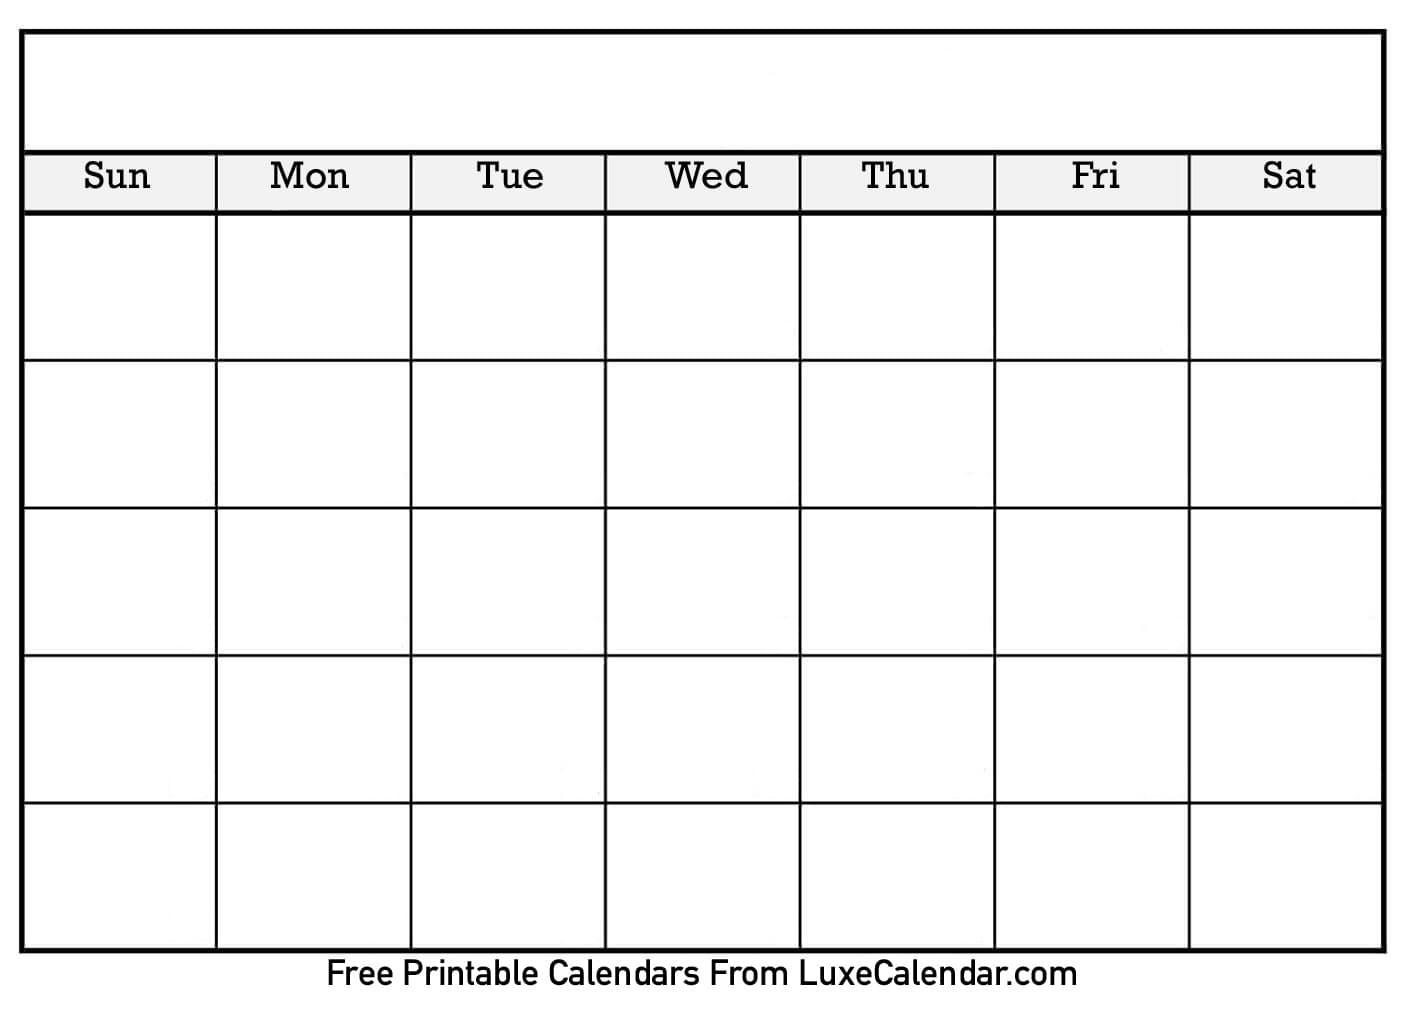 Blank Printable Calendar - Luxe Calendar_Blank Calendar By Month